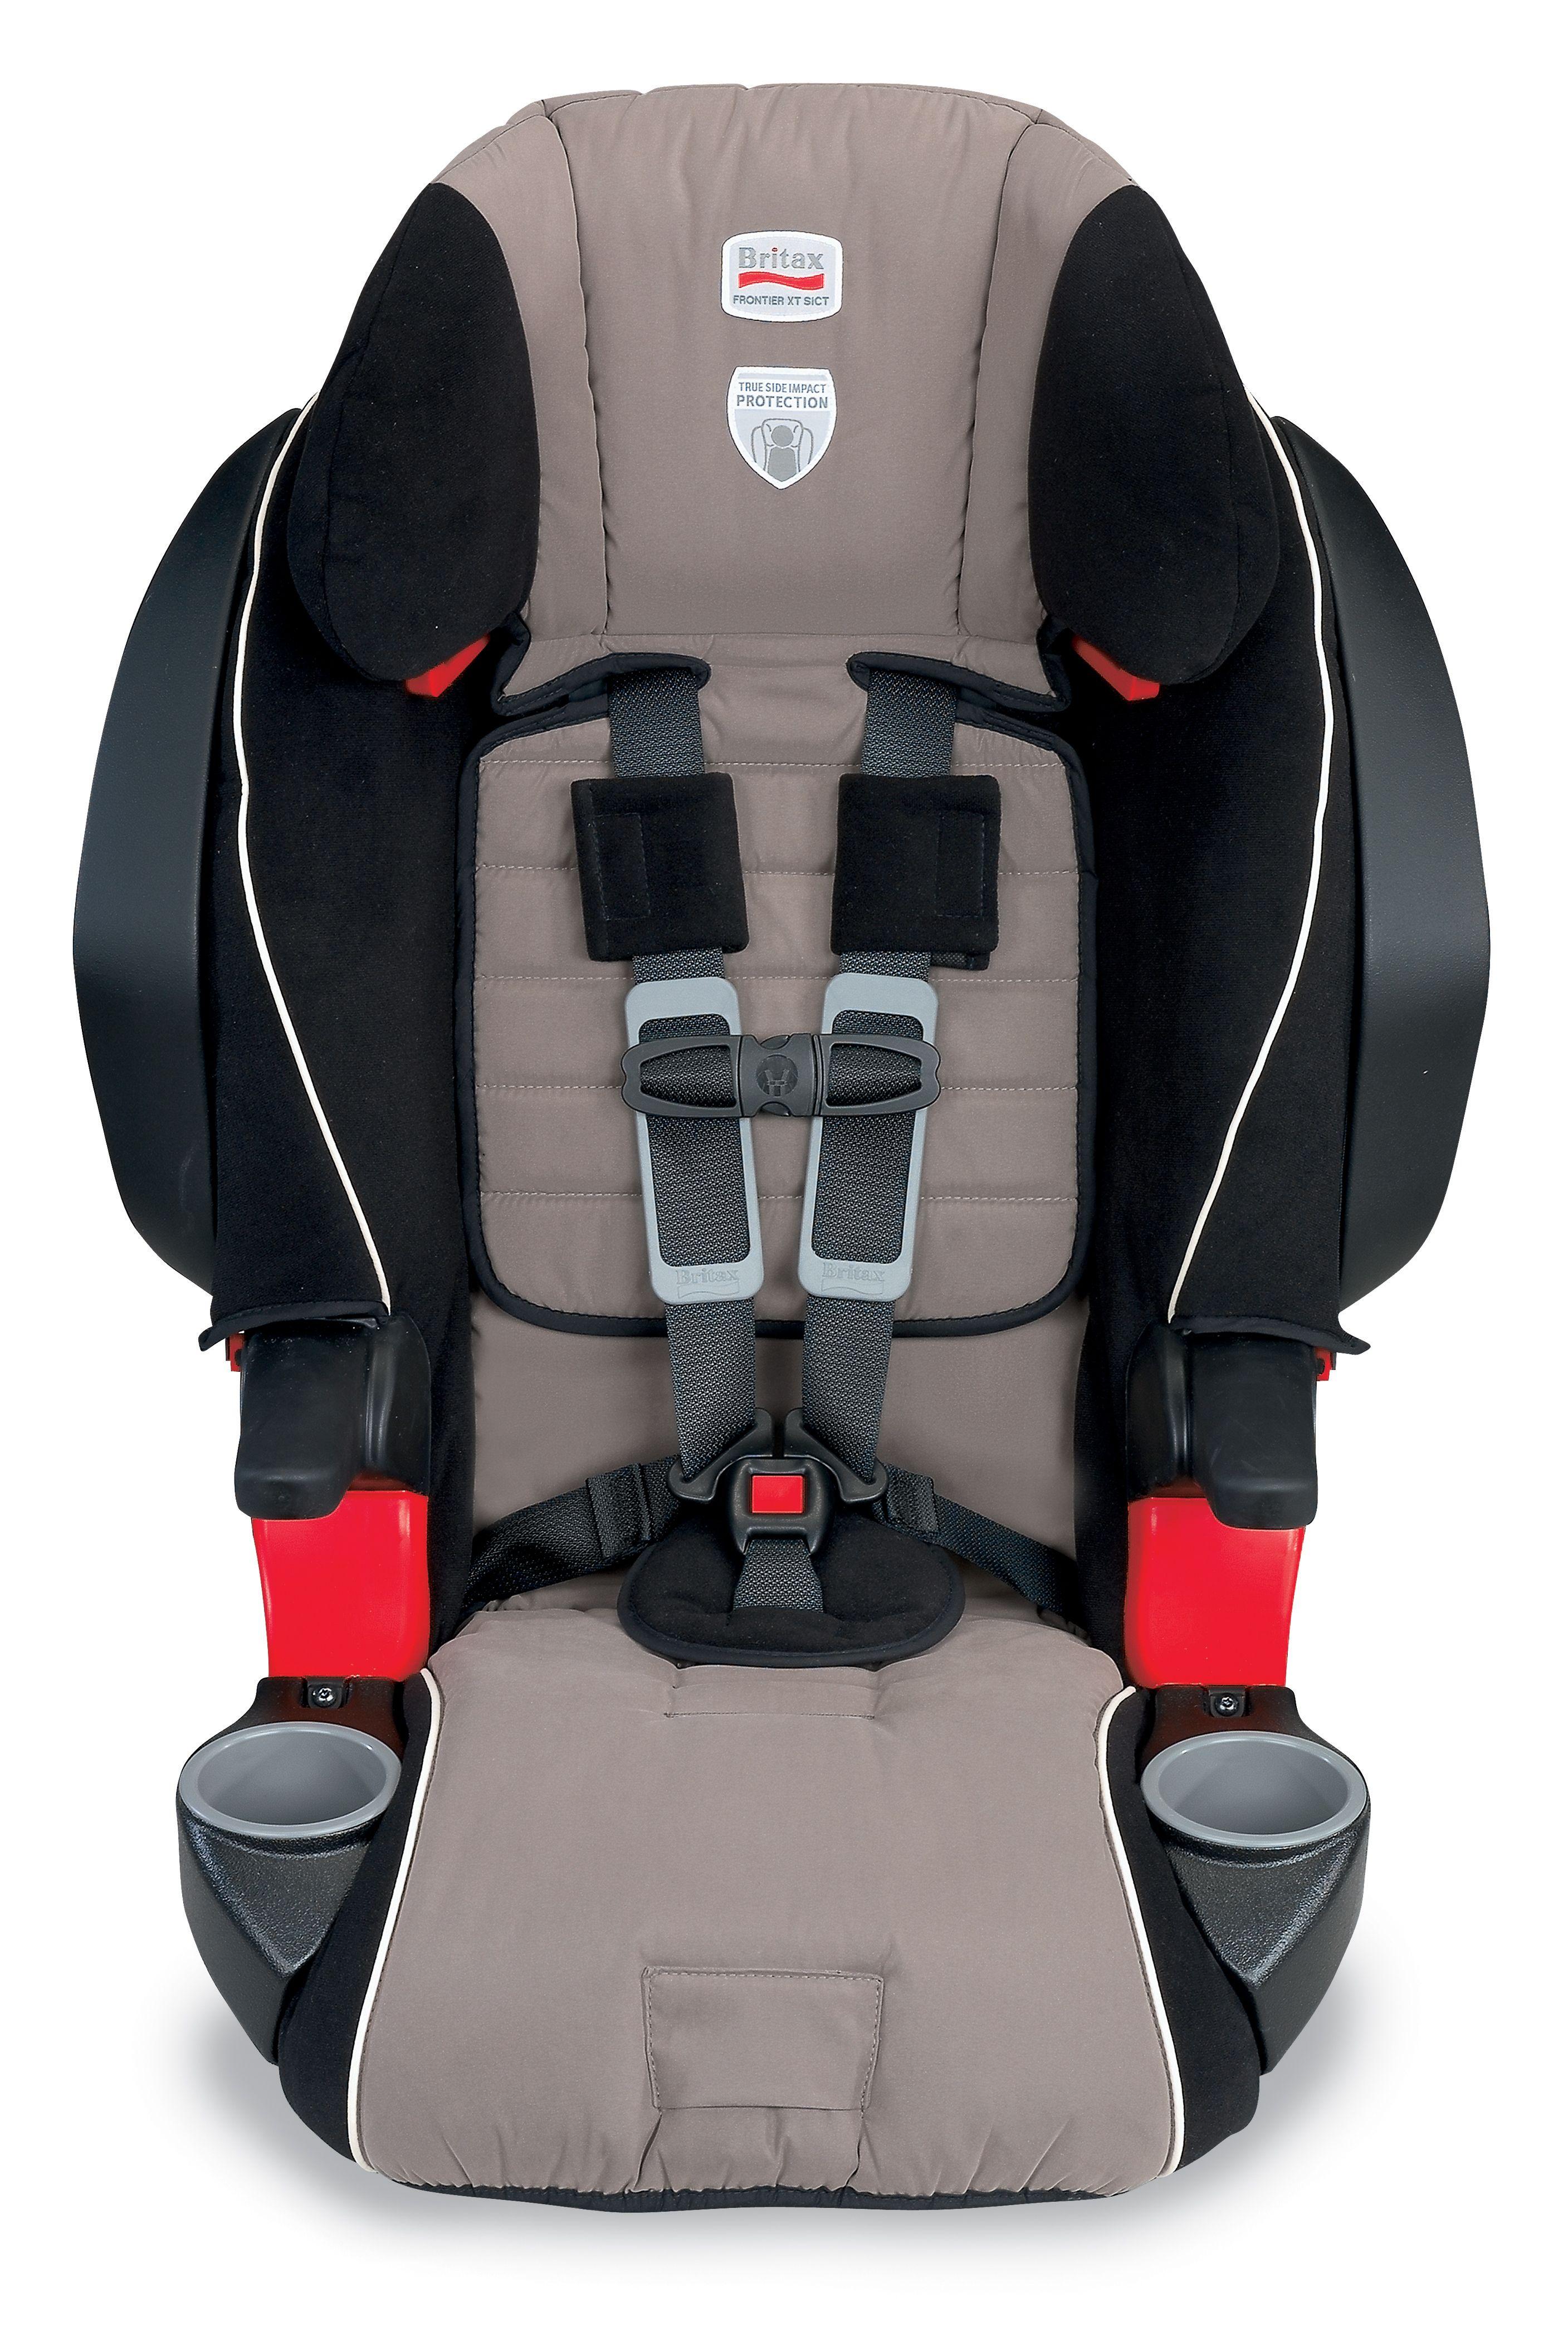 Britax Frontier Xt Sict Portobello Britax Booster Car Seat